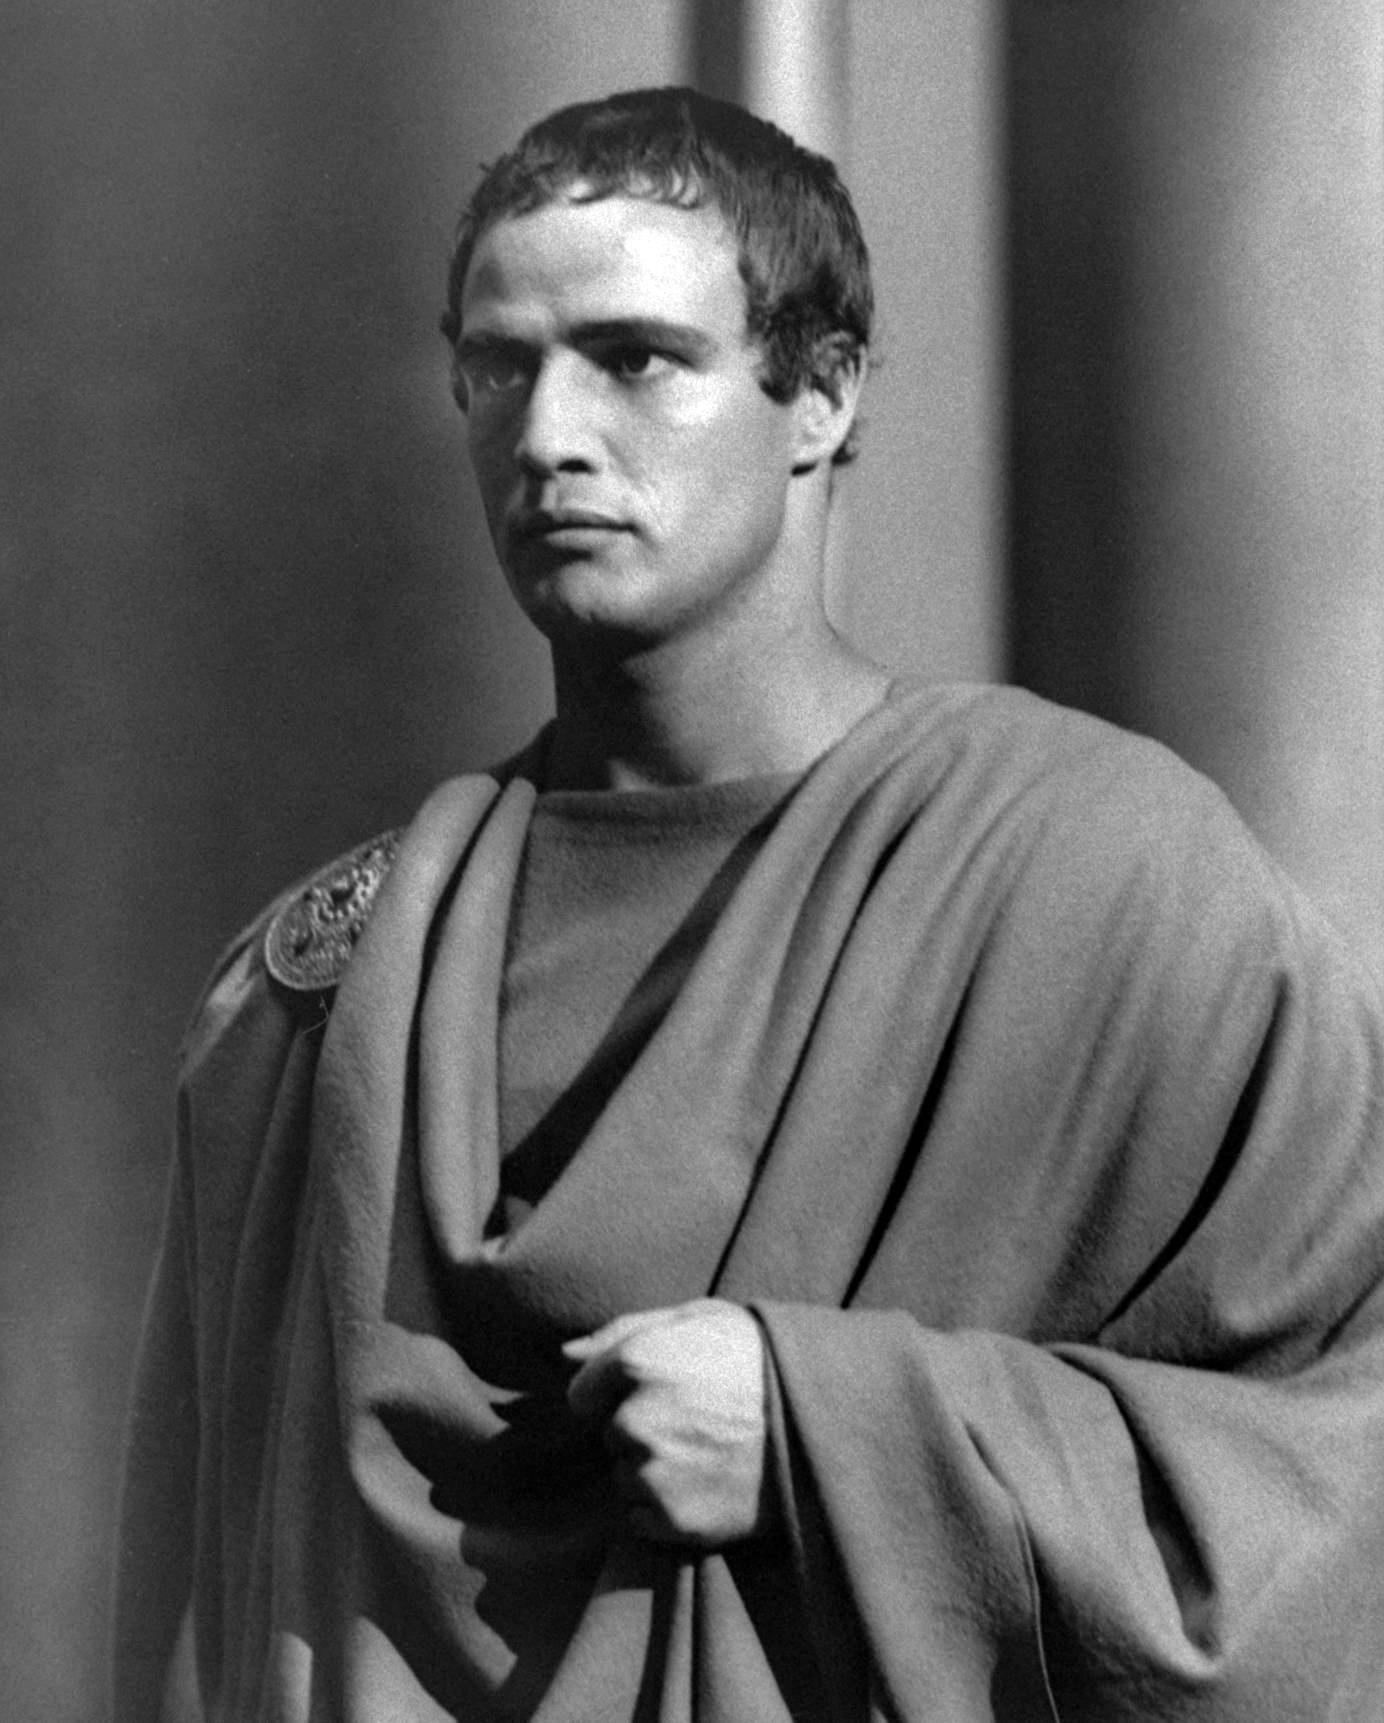 julus ceasar Gaius julius caesar, beter bekend als julius caesar of caesar, was een  romeinse politicus en generaal die officieel een einde maakte aan de romeinse .